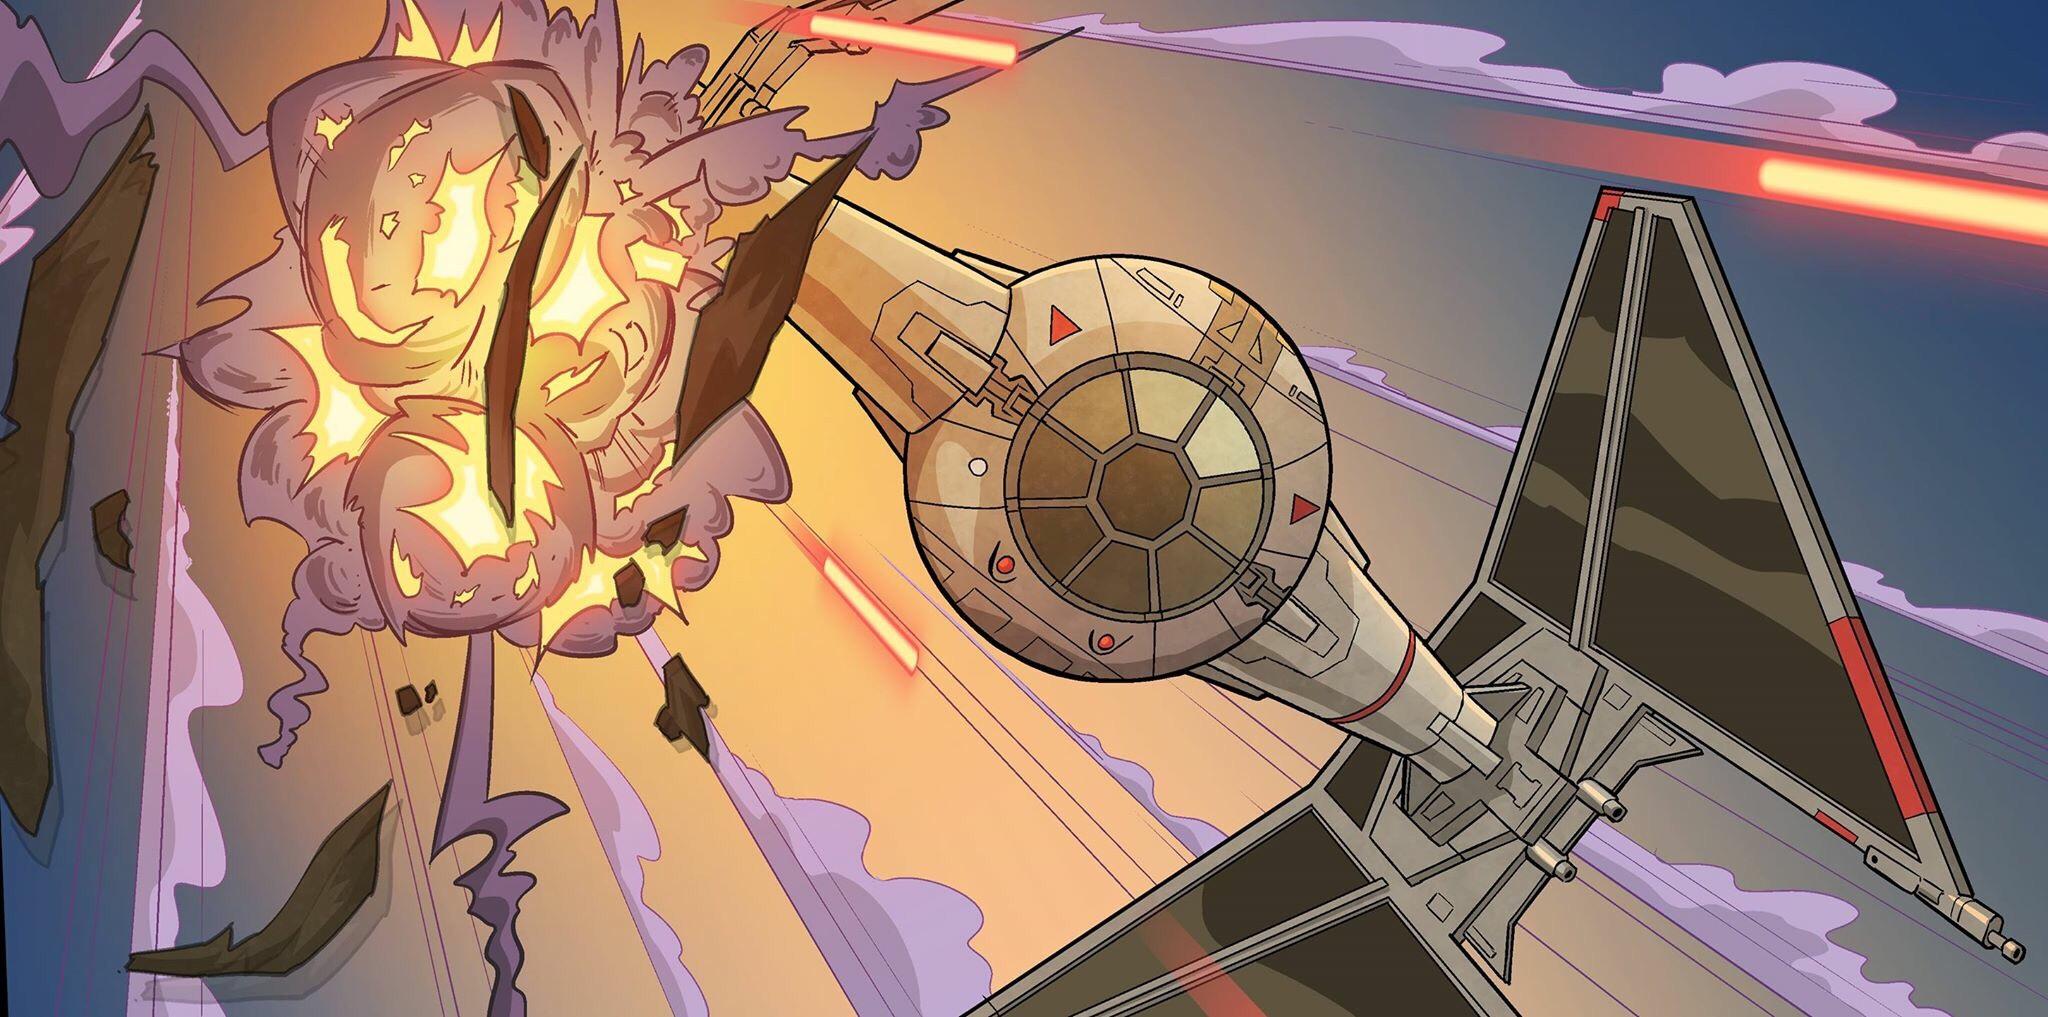 Star Wars art by Bob Molesworth